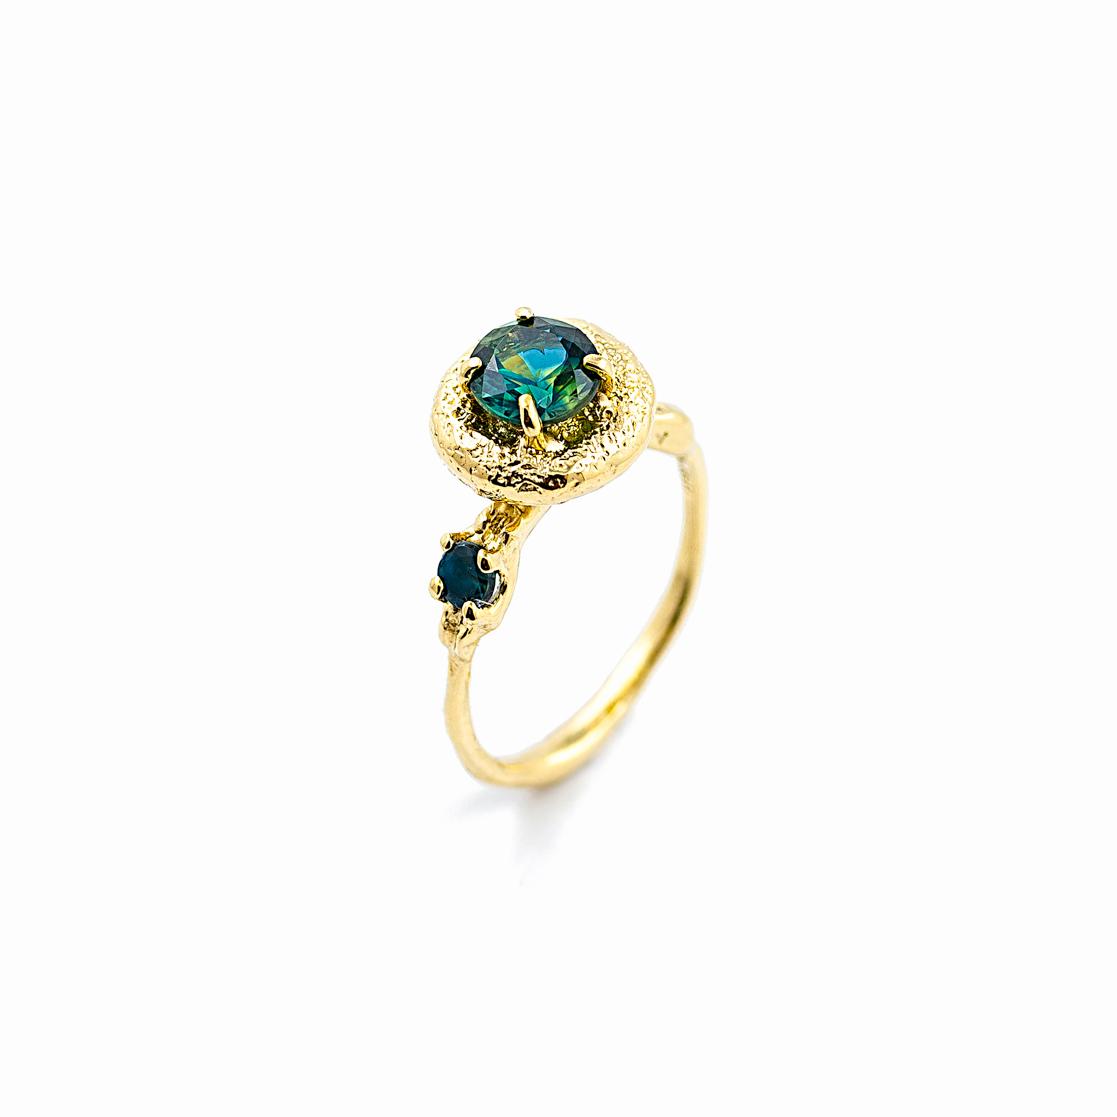 Surfacing Engagement Ring   18ct yellow gold, Australian sapphire, alexanderite.